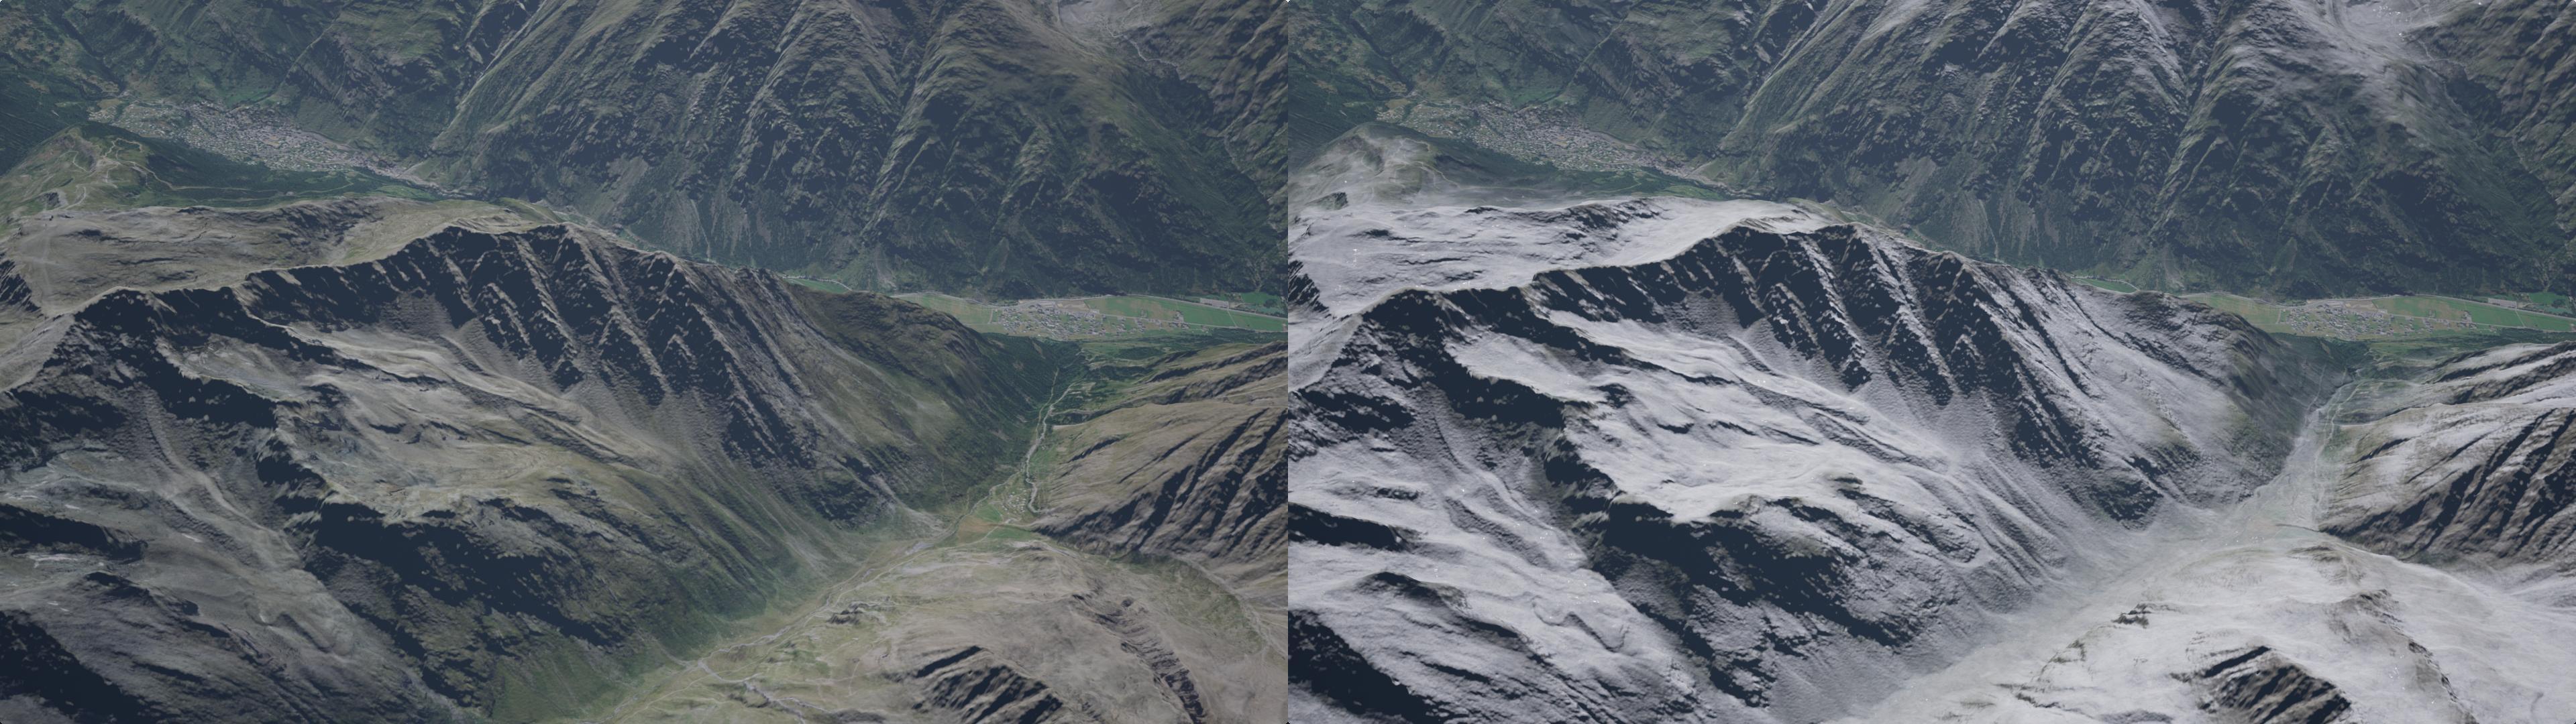 snow comparison